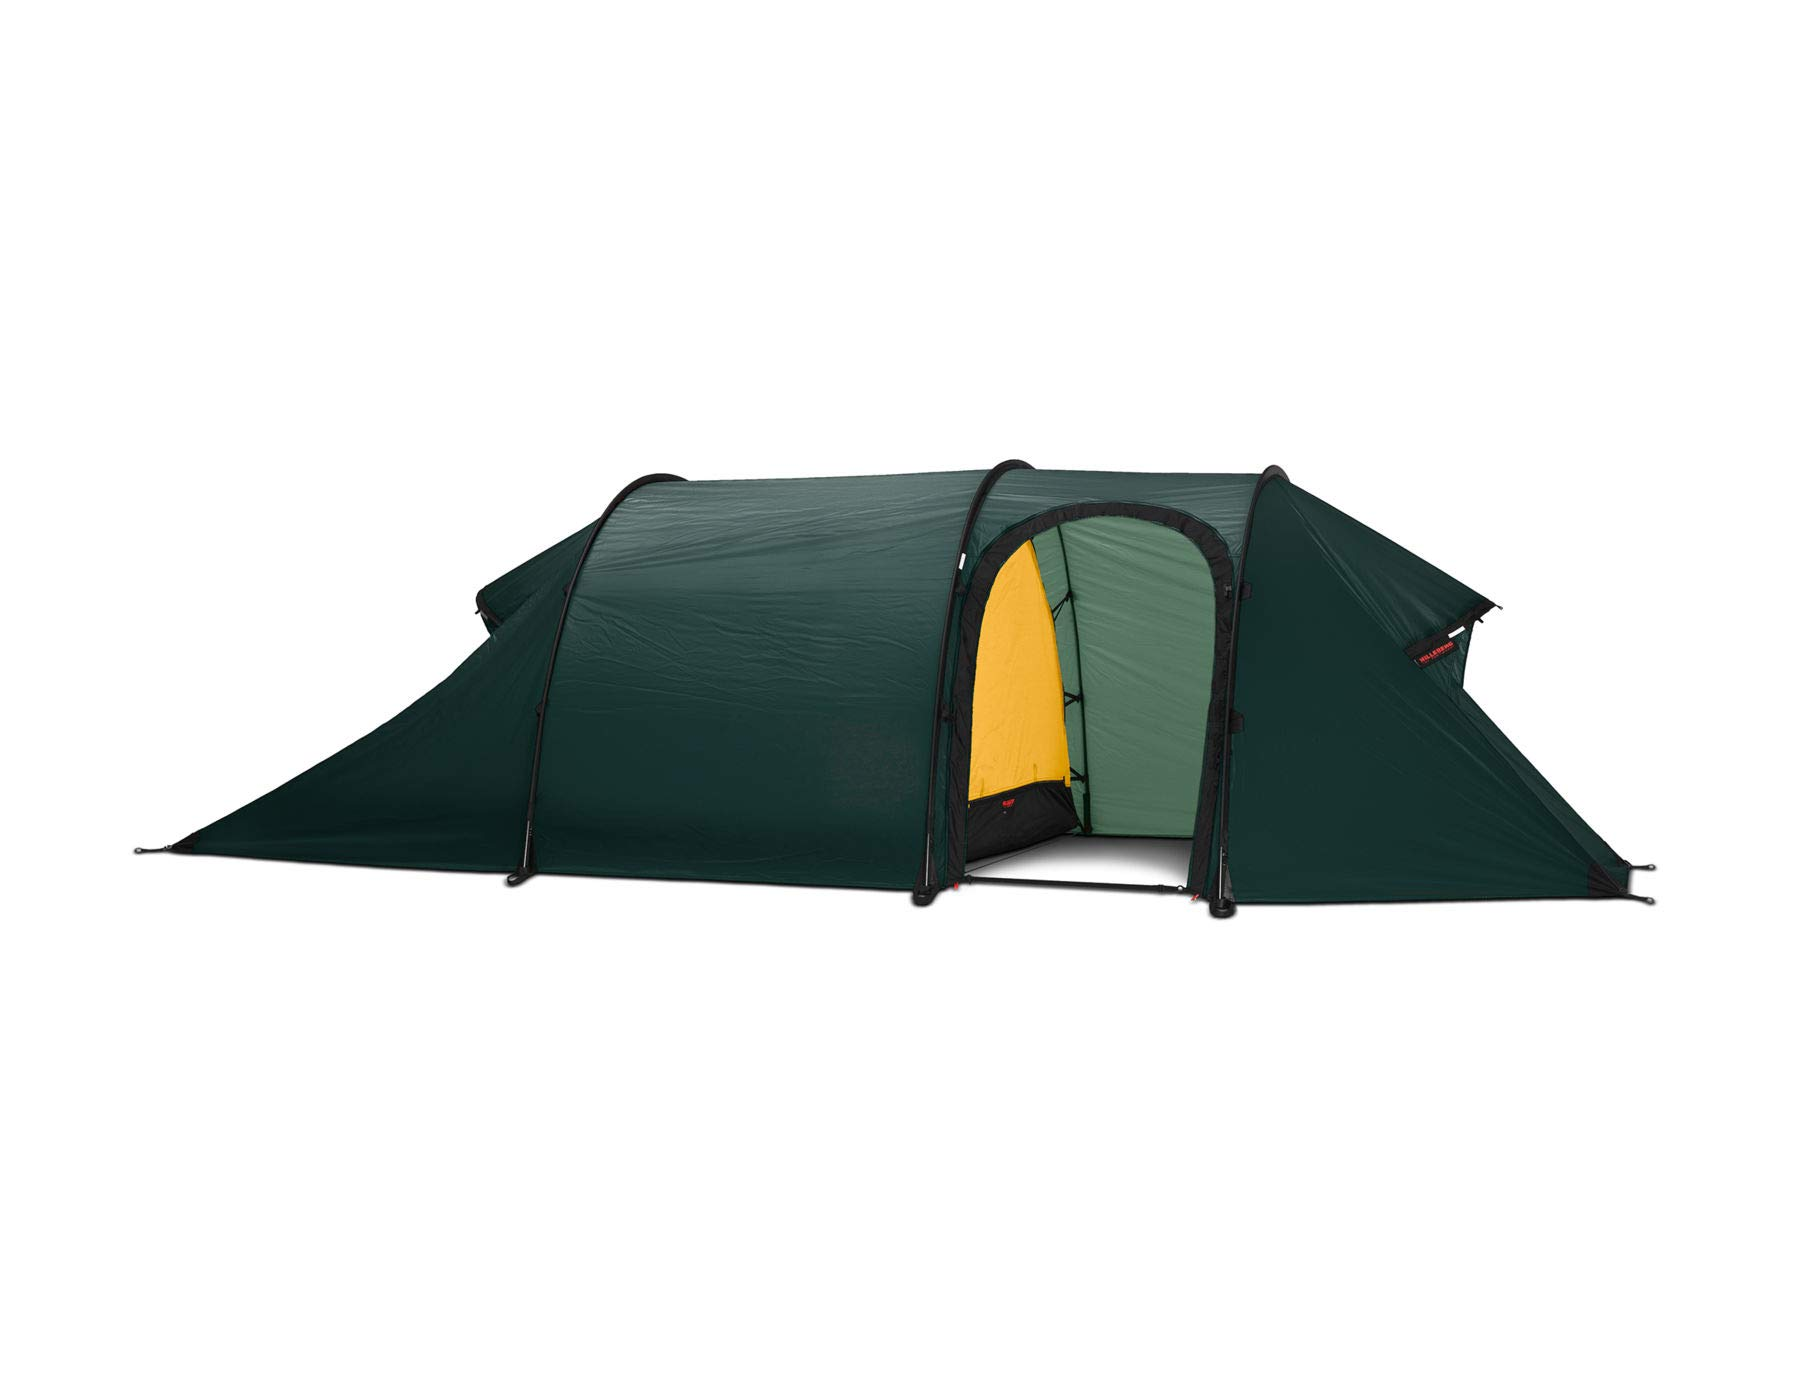 Hilleberg-Nammatj-GT-3-Person-Tent